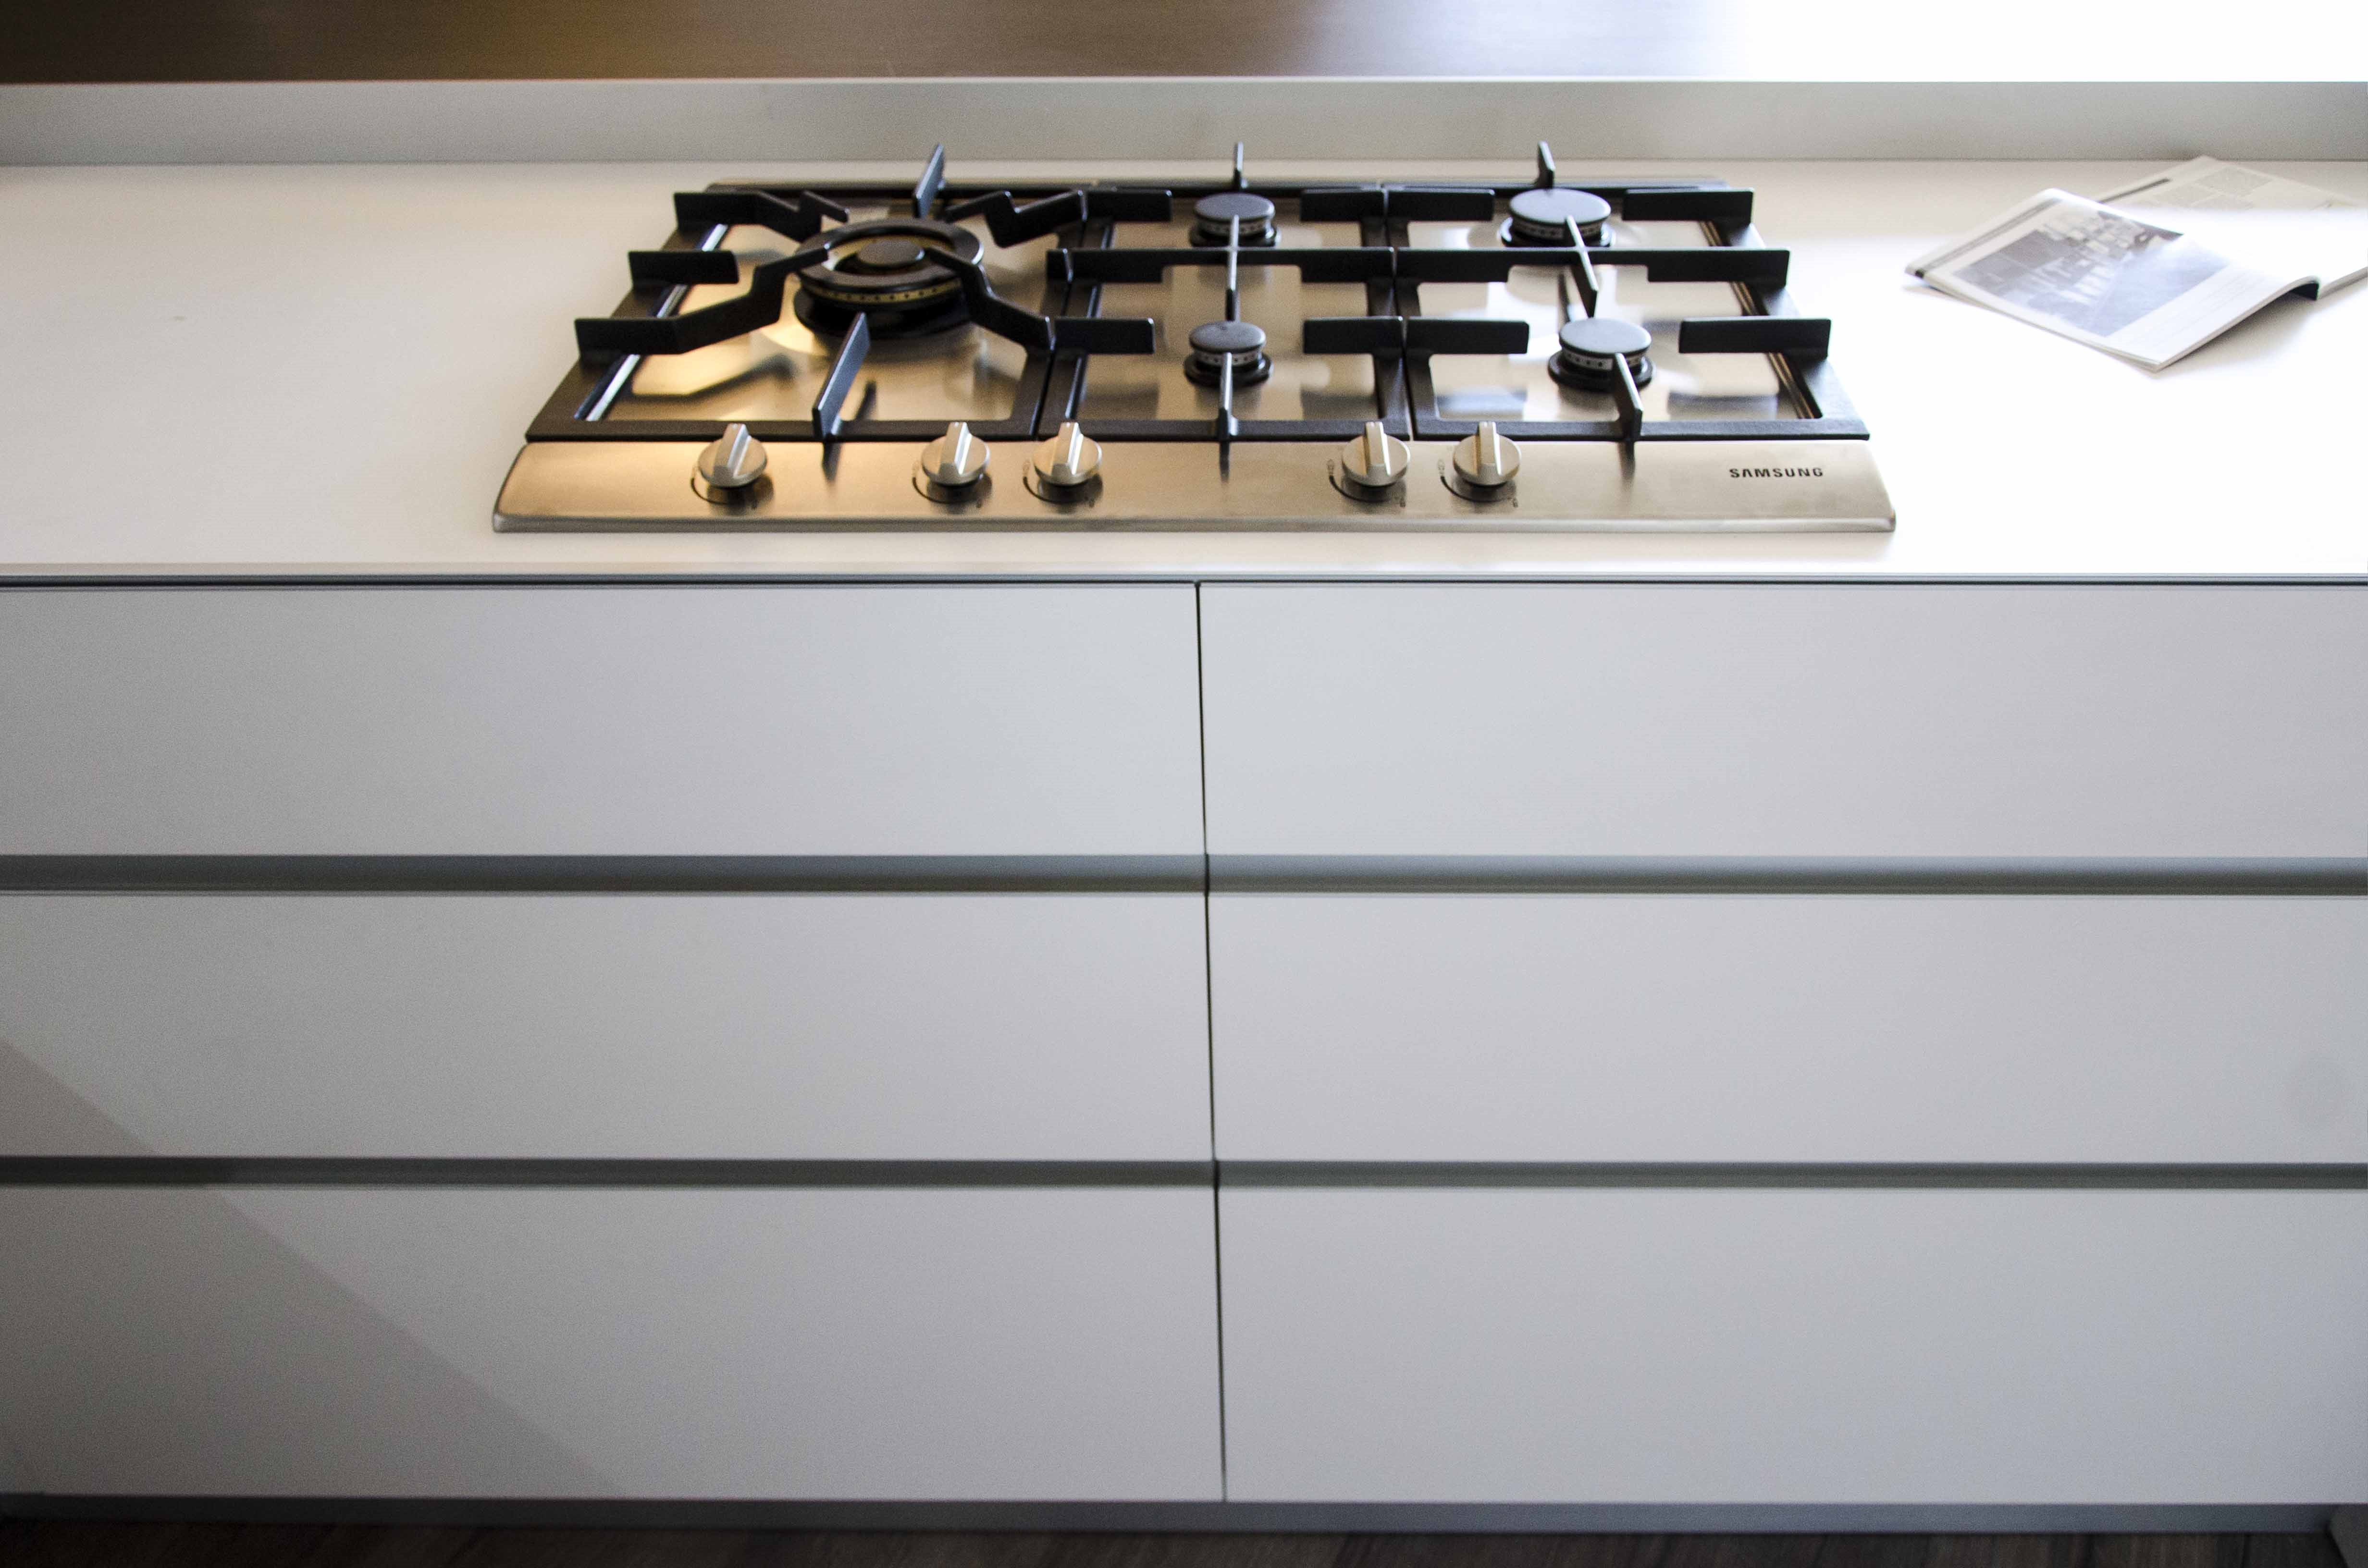 demode cucine opinioni - 28 images - stunning demode cucine opinioni ...